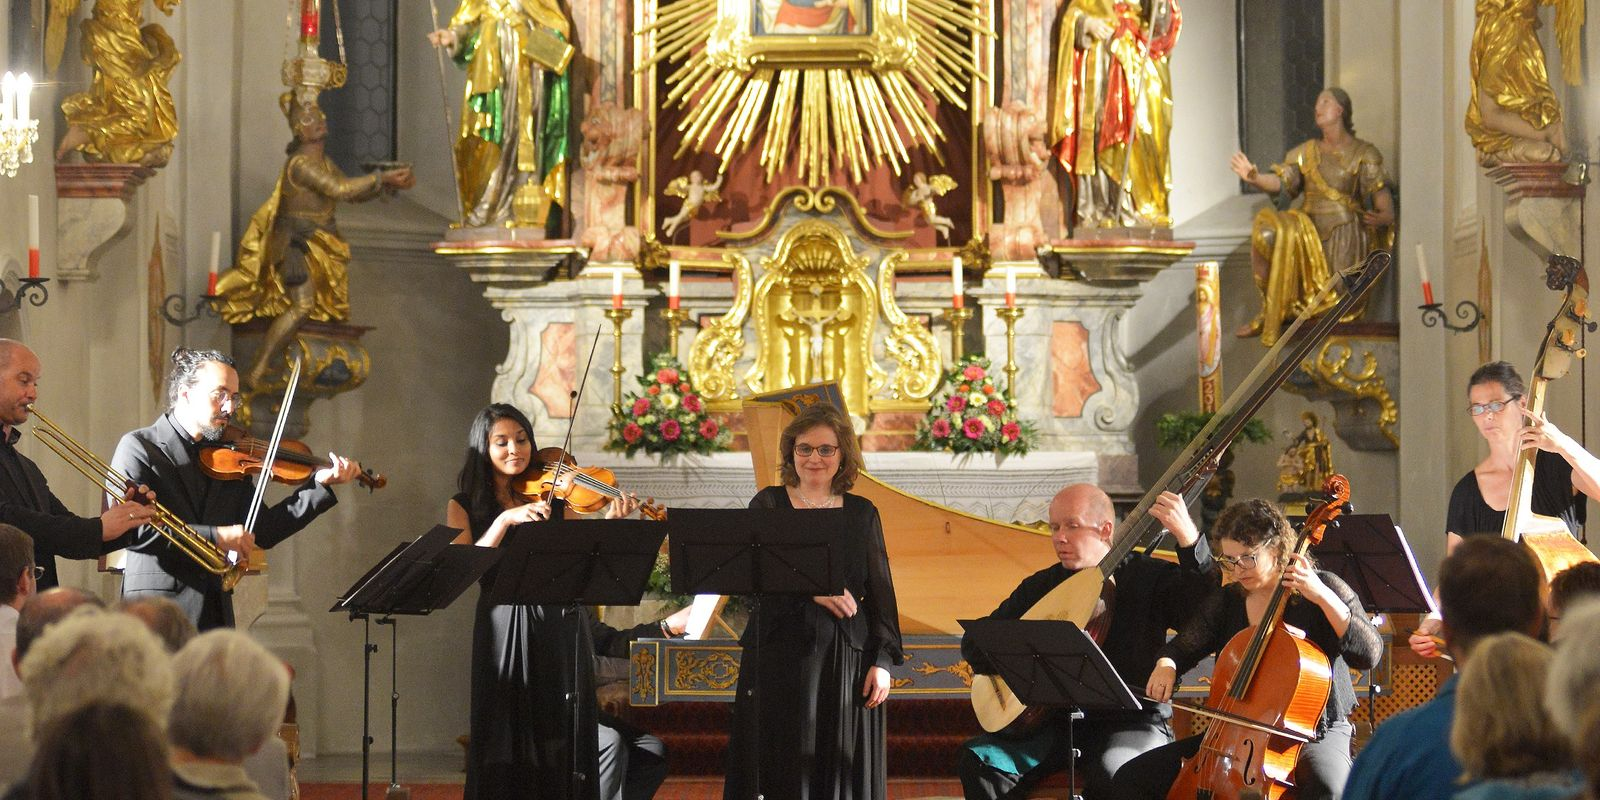 Musikensemble Laudonia in der Pfarrkirche